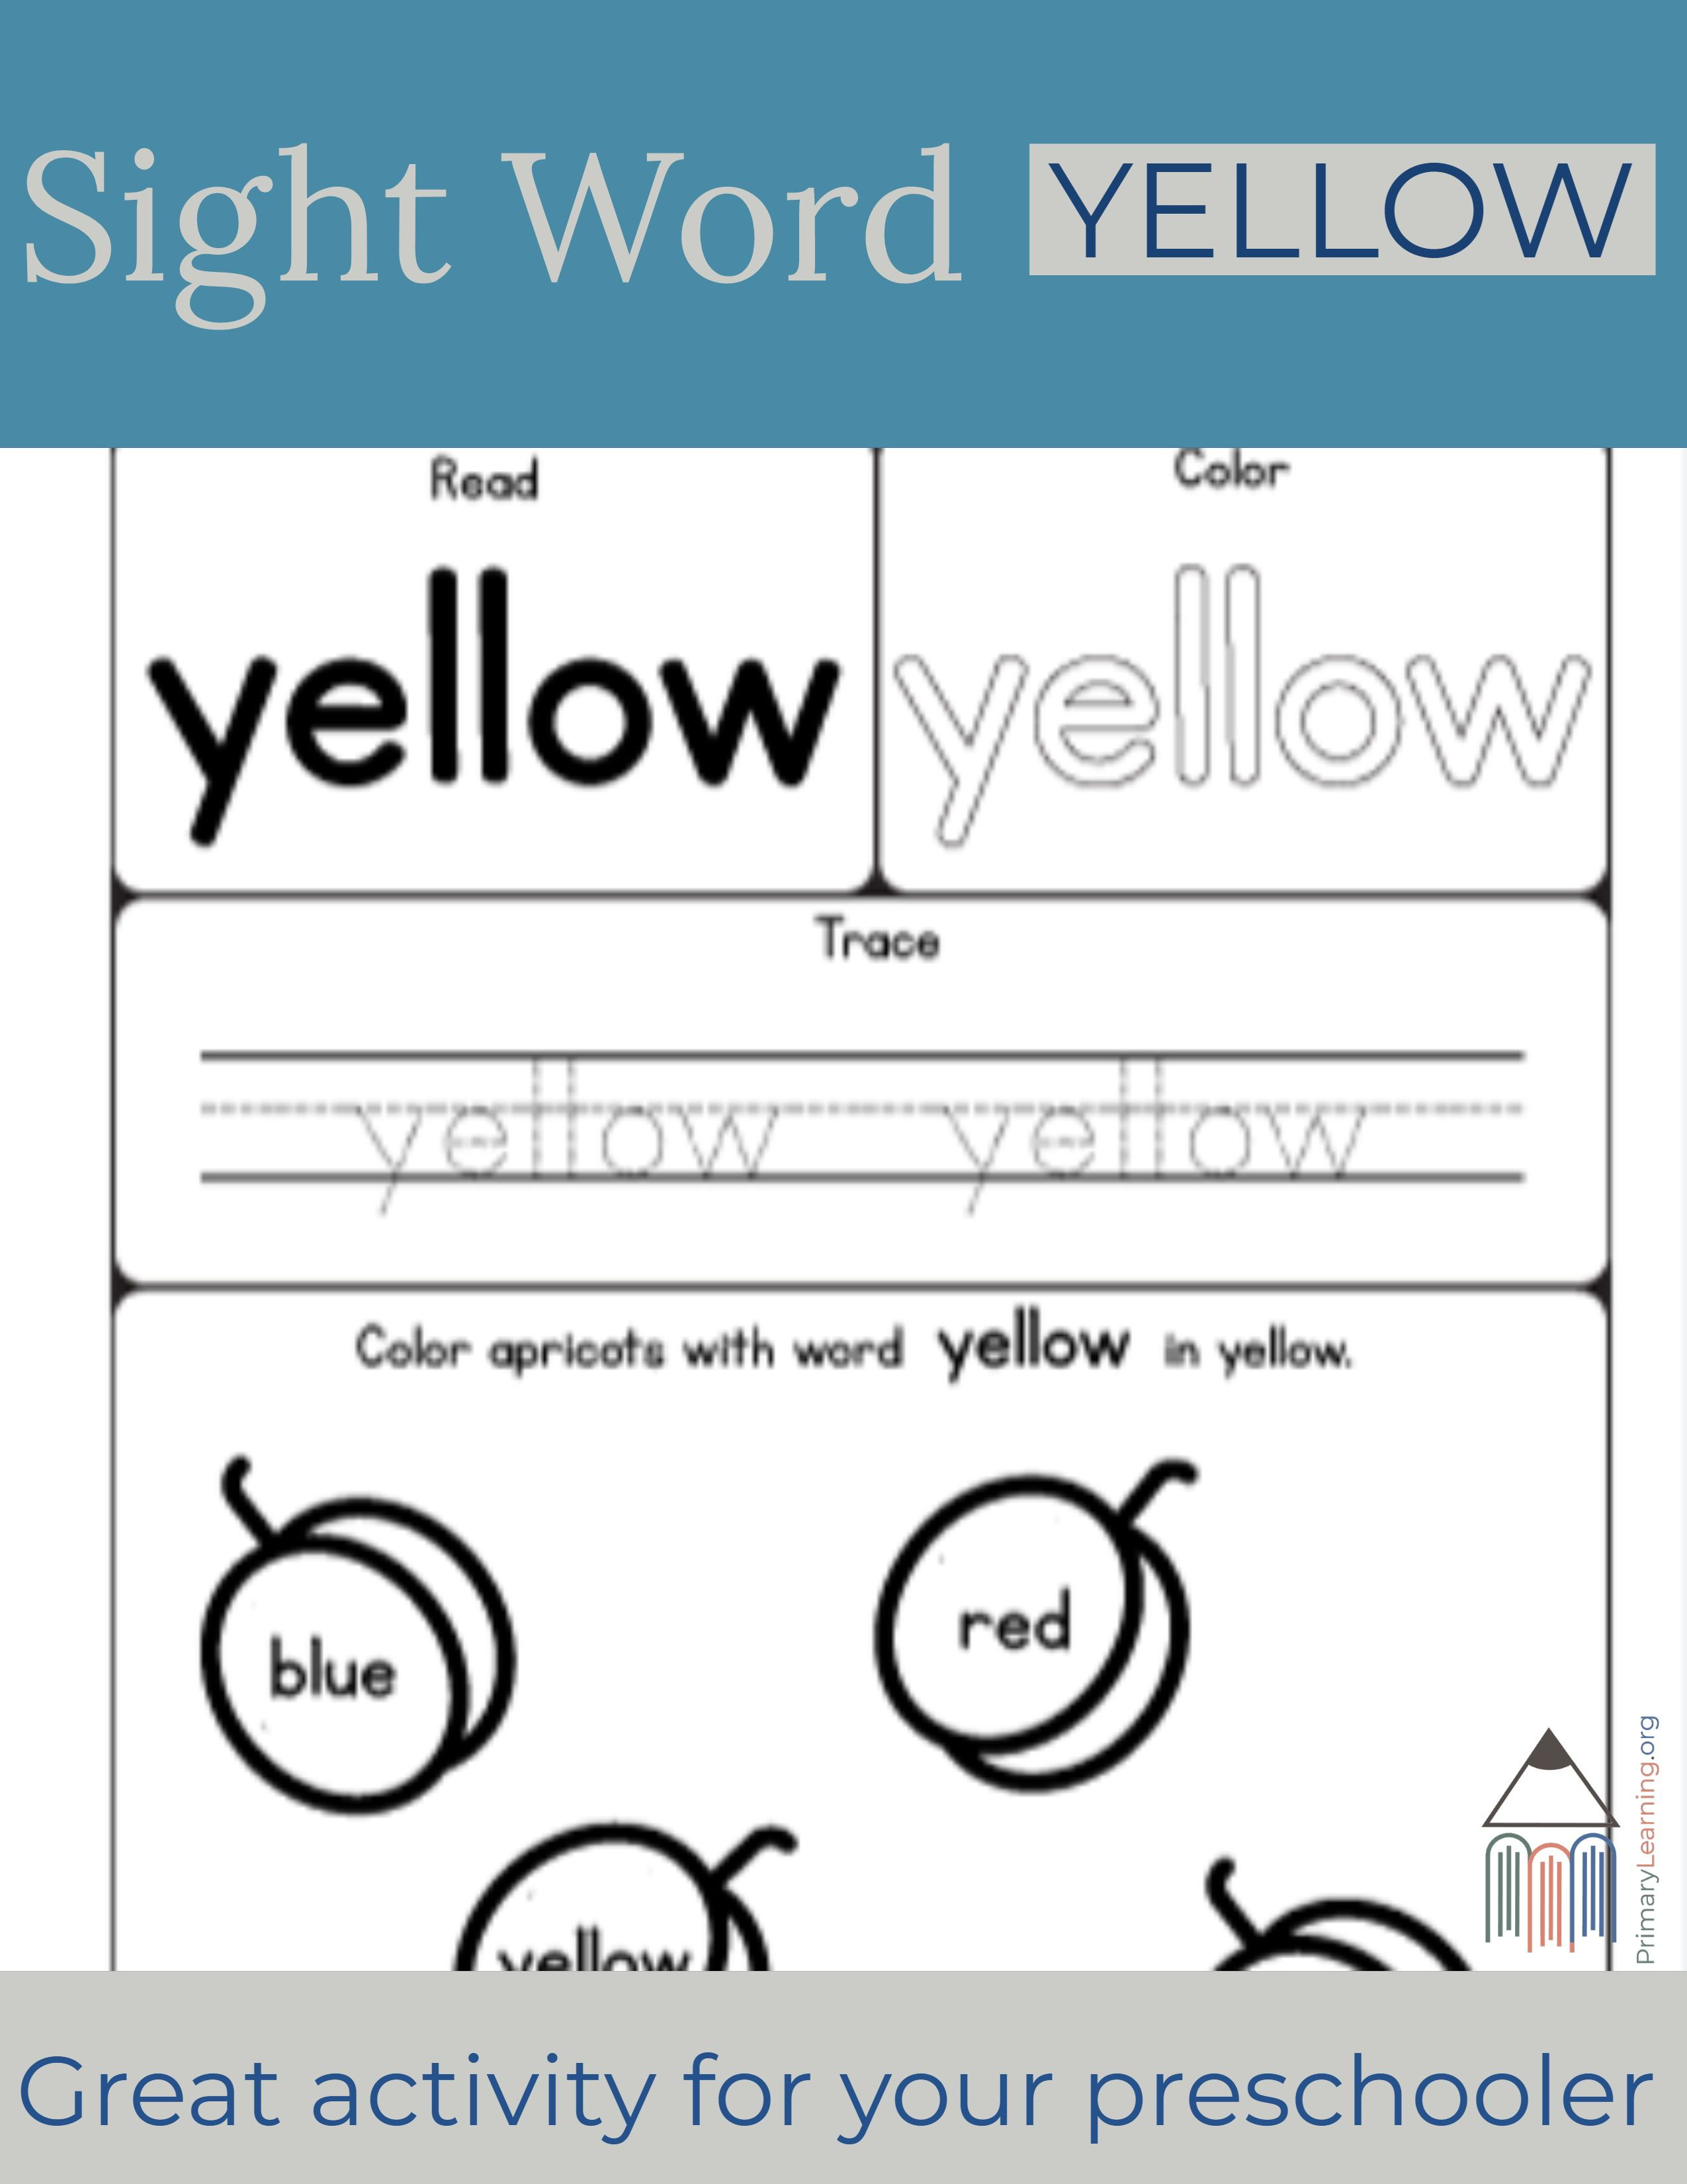 Sight Word Yellow Worksheet